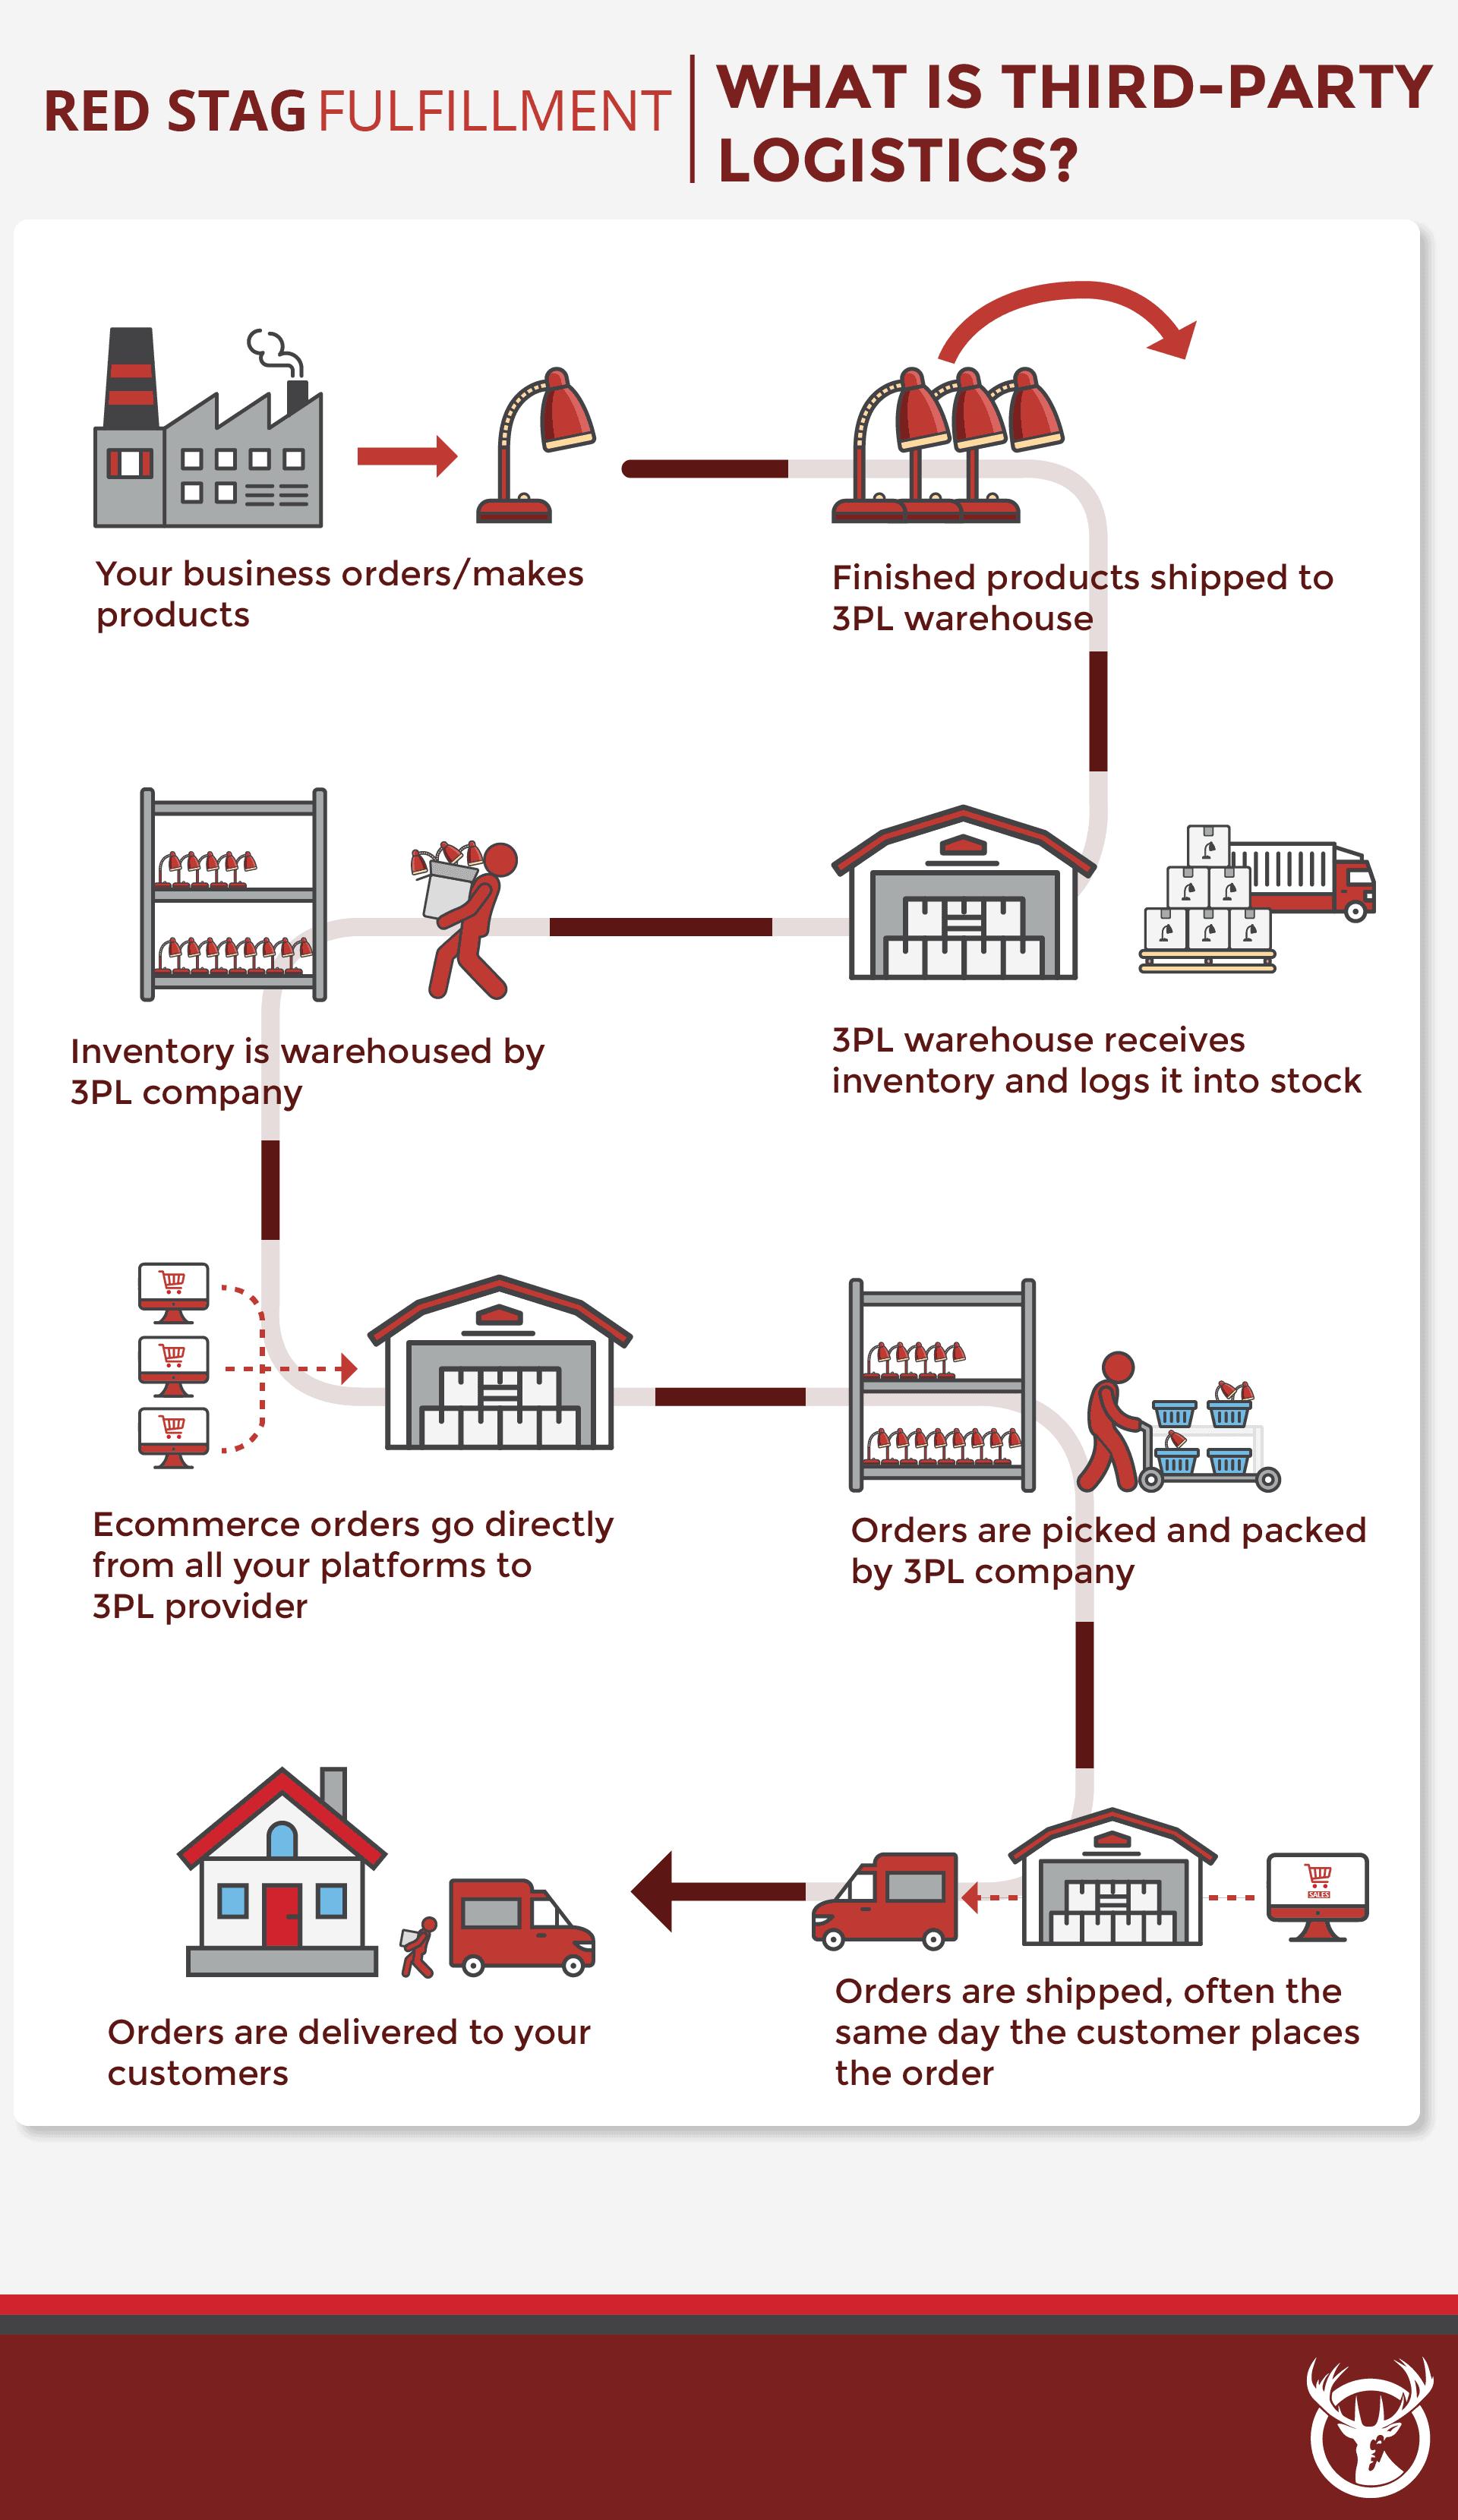 third-party logistics process description